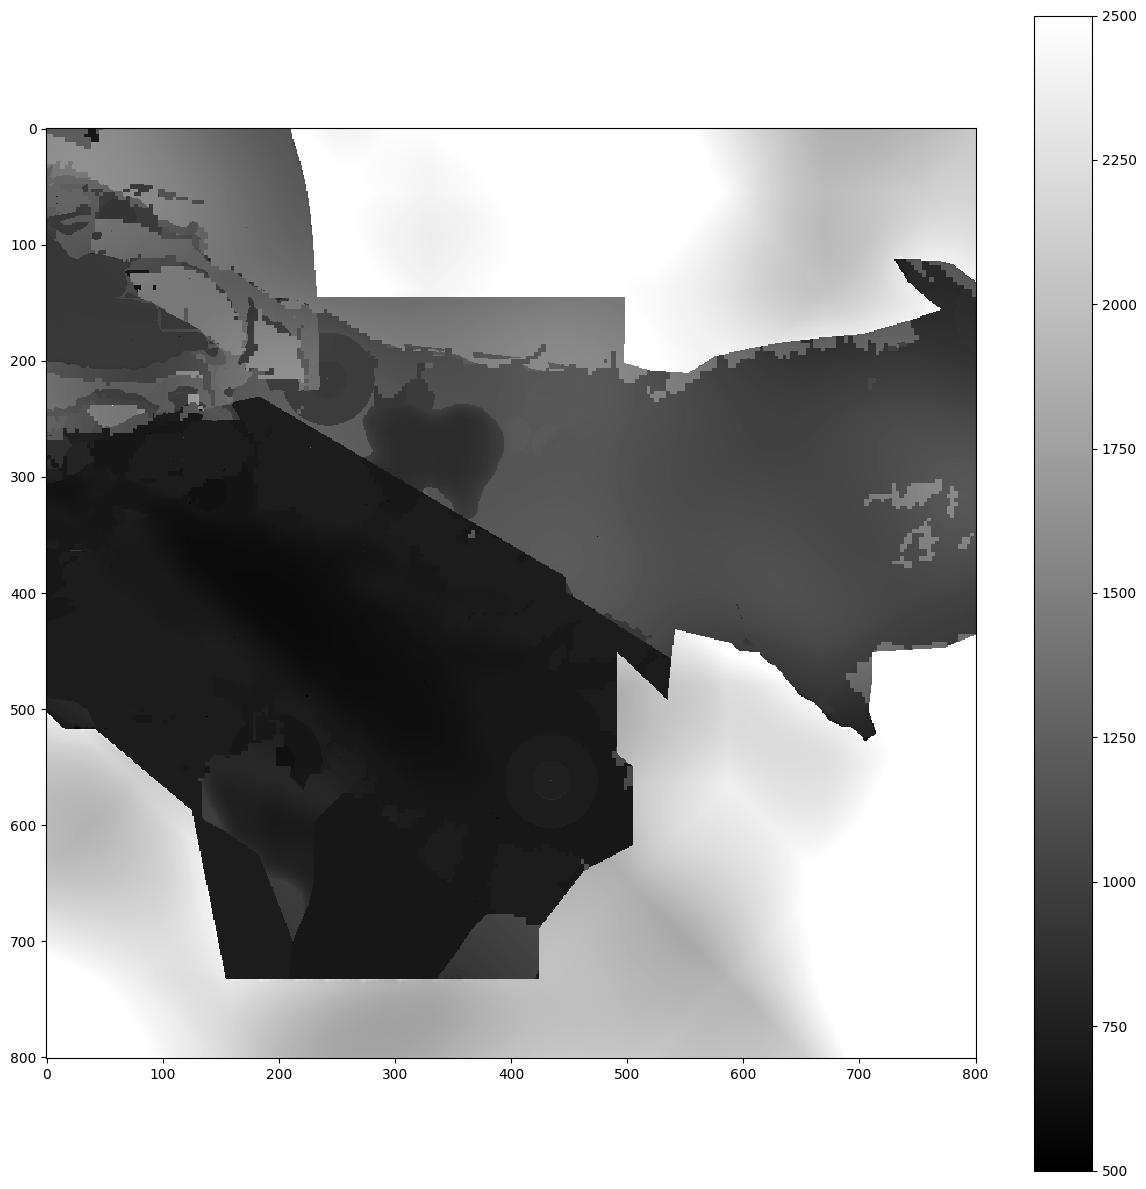 bench/seismic/wp/la_habra/meshes/velocity_model/plots/vs_250.png